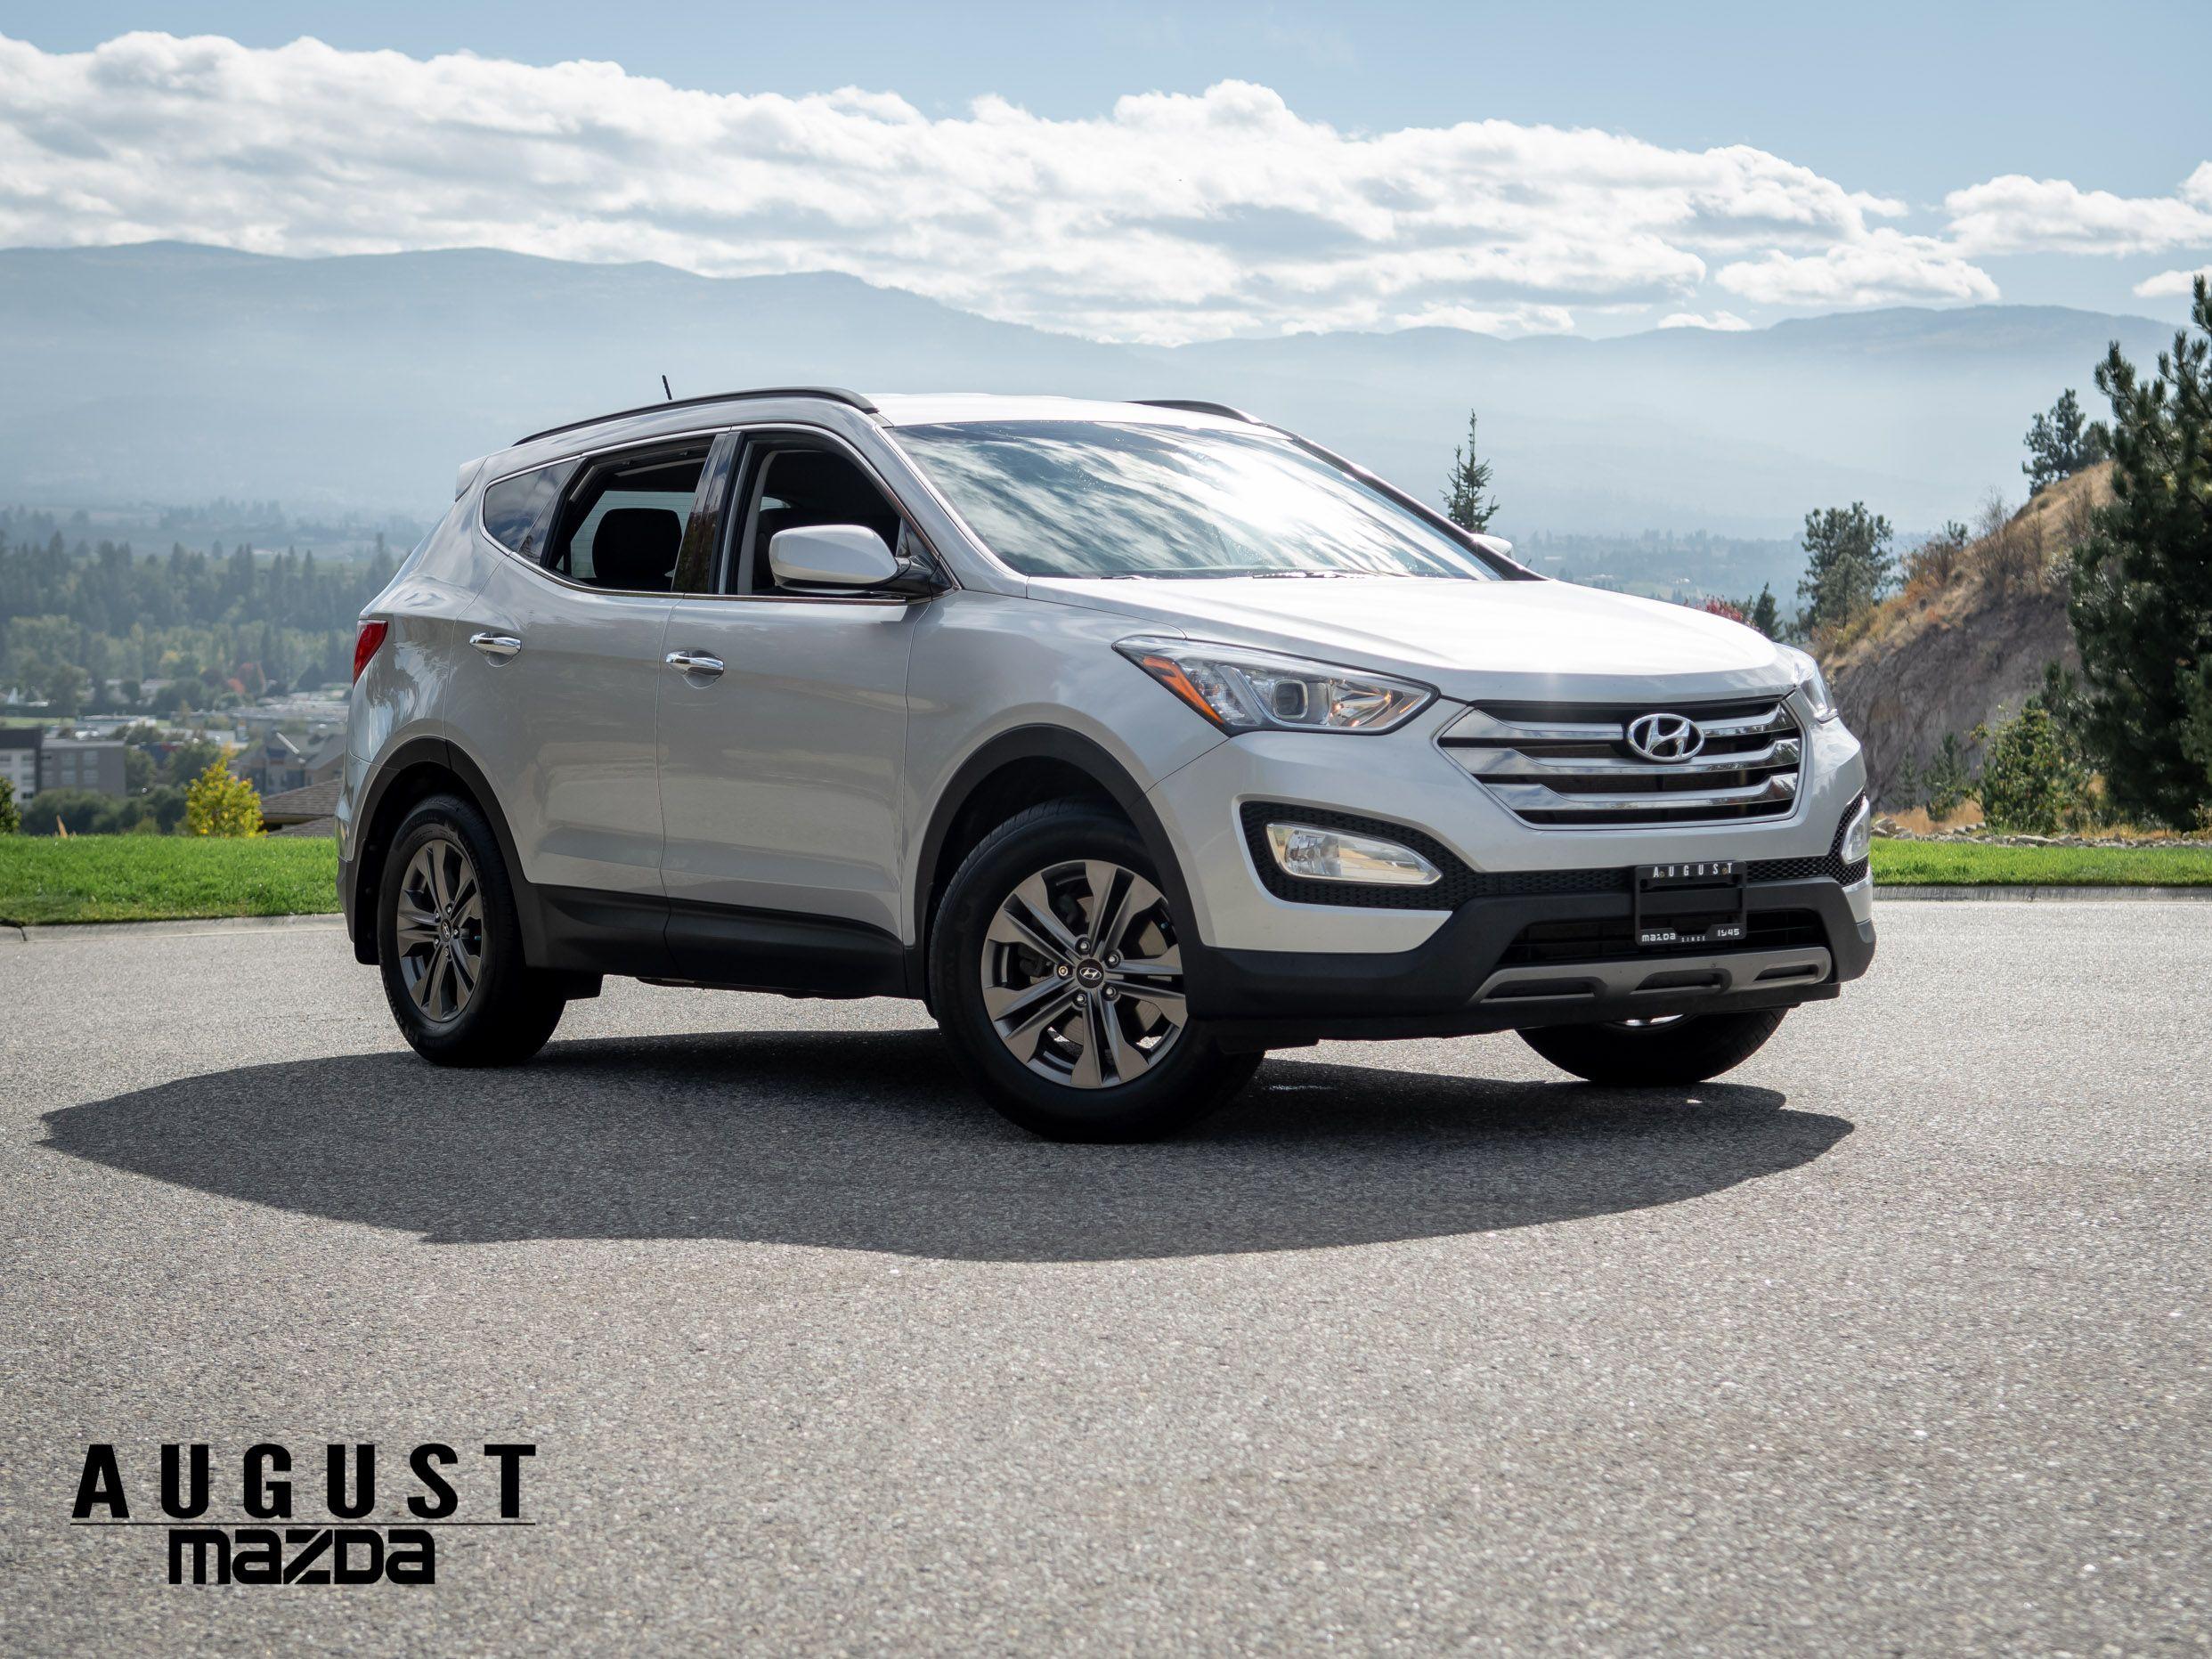 Pre Owned 2015 Hyundai Santa Fe Sport 2 4 Premium In Kelowna Bc Canada 541 6782a August Luxury Motorcars